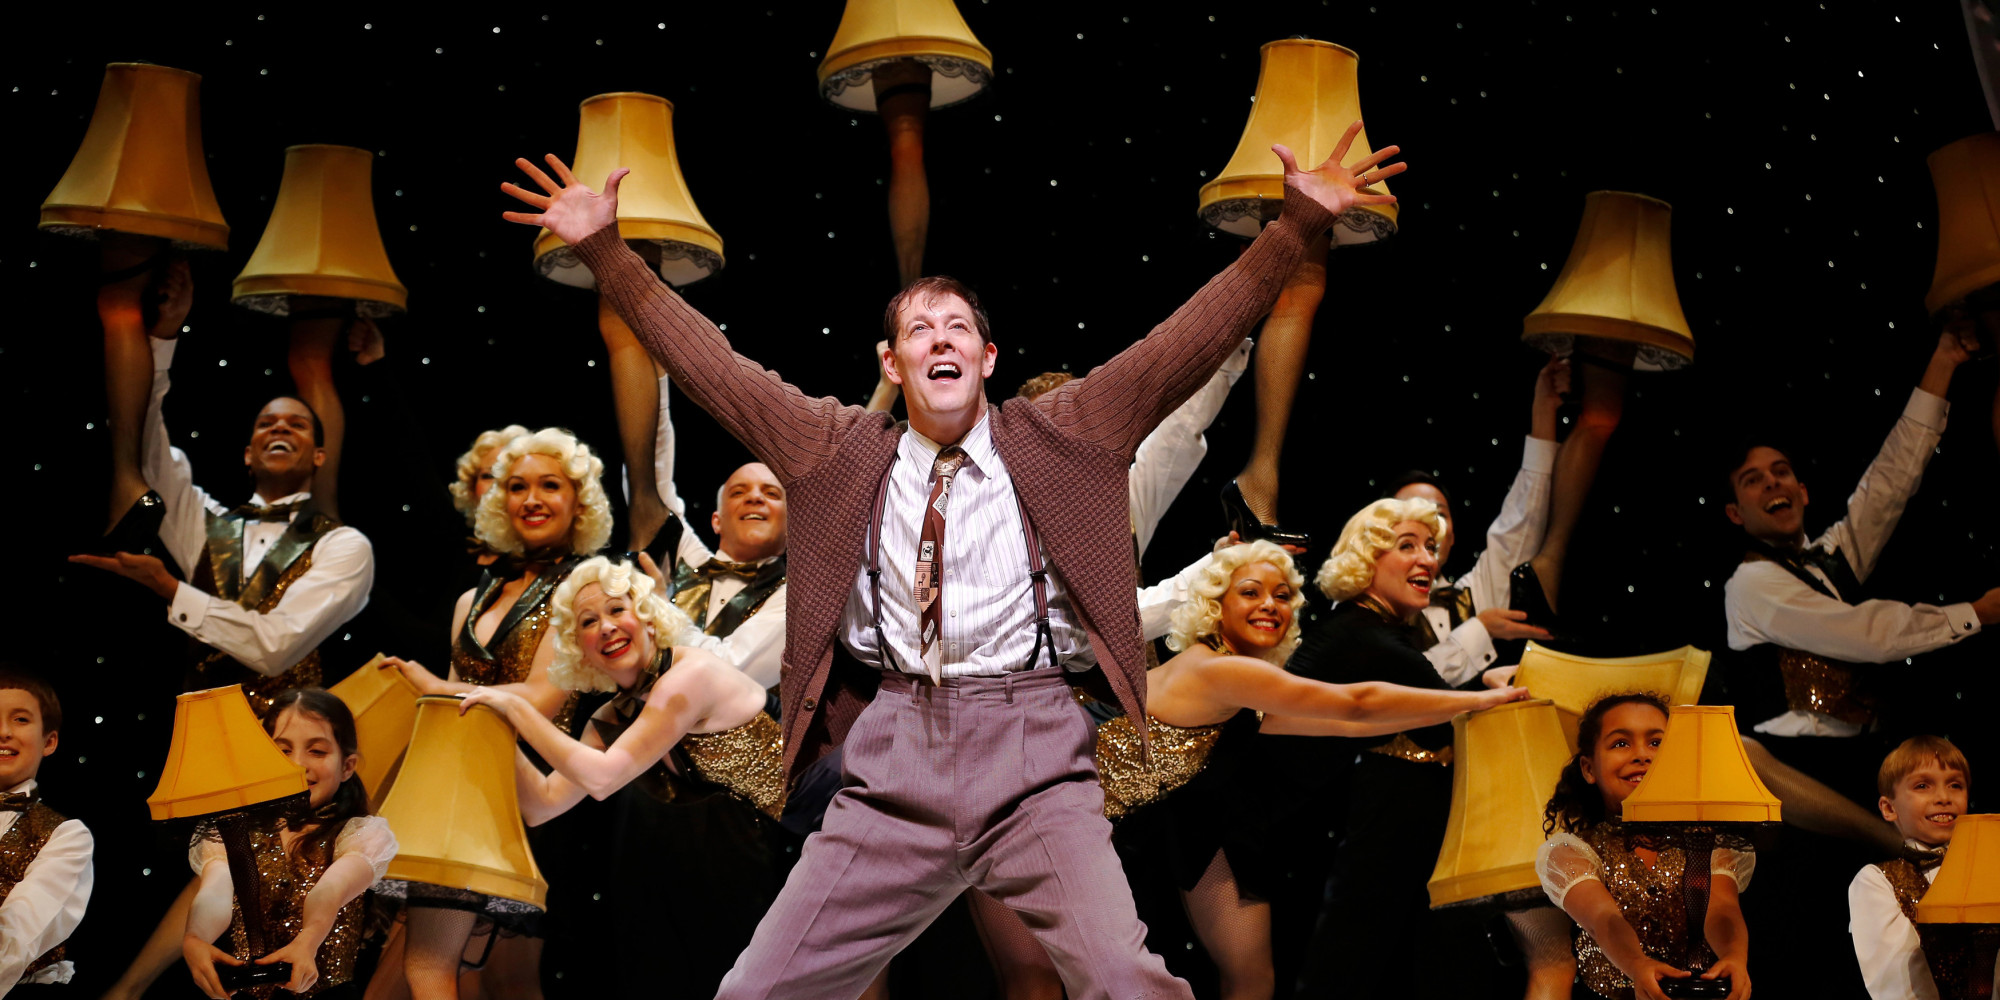 musical christmas story holiday hit york hartford engagements boston huffpost